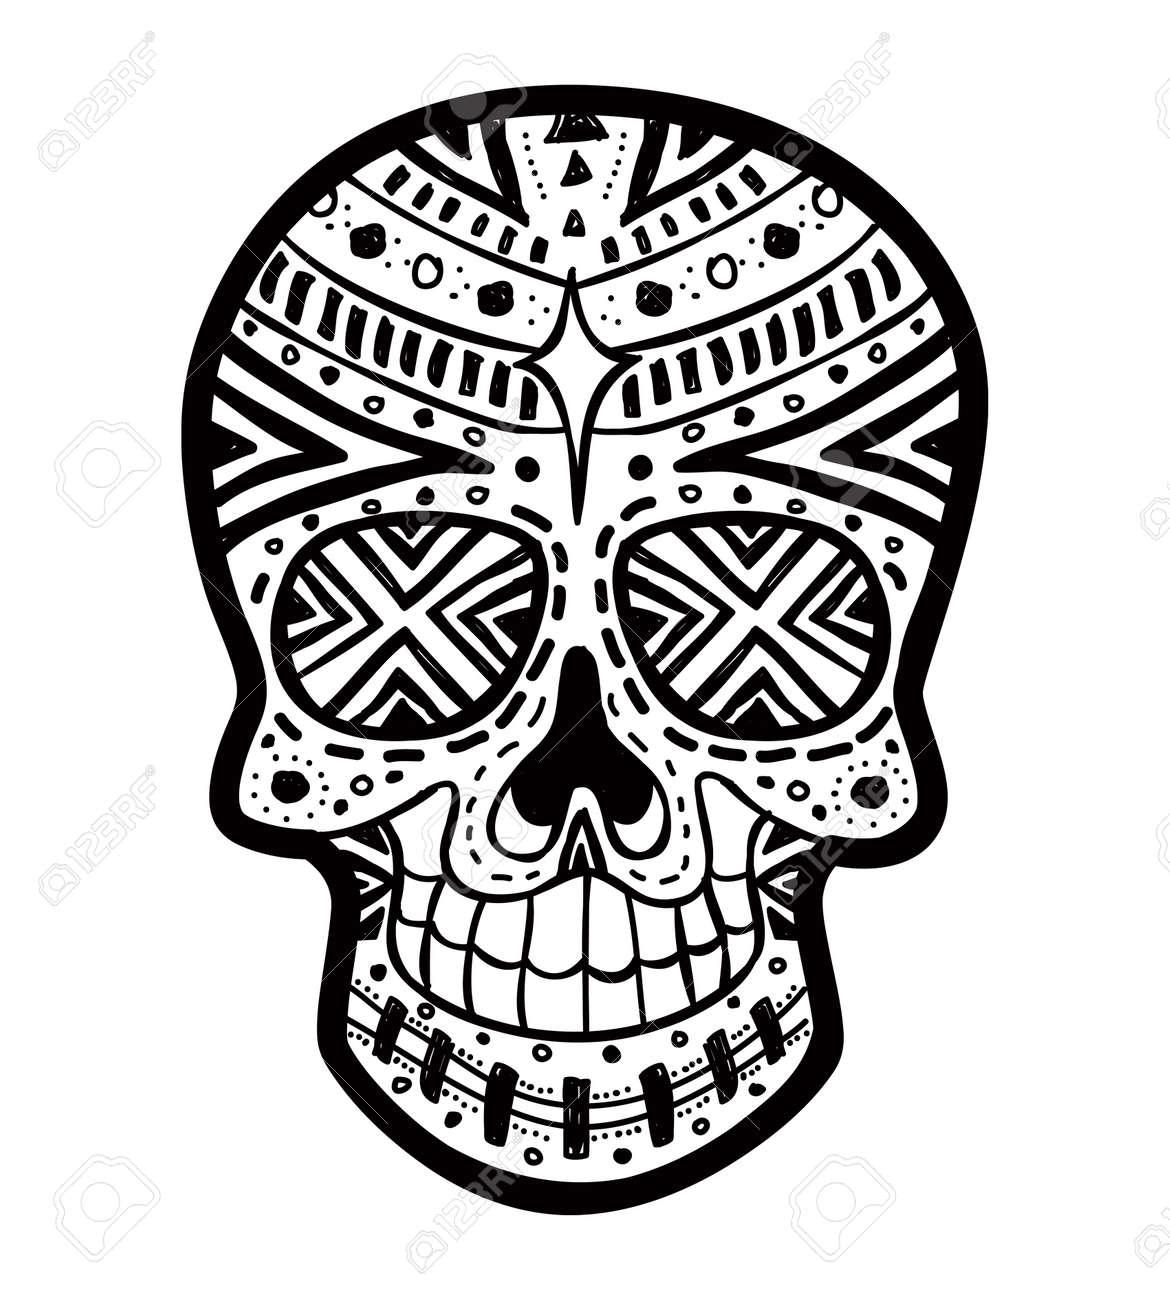 Black And White Sugar Skull Designs Simple Sugar Skull Black And White Sugar Skull Black And